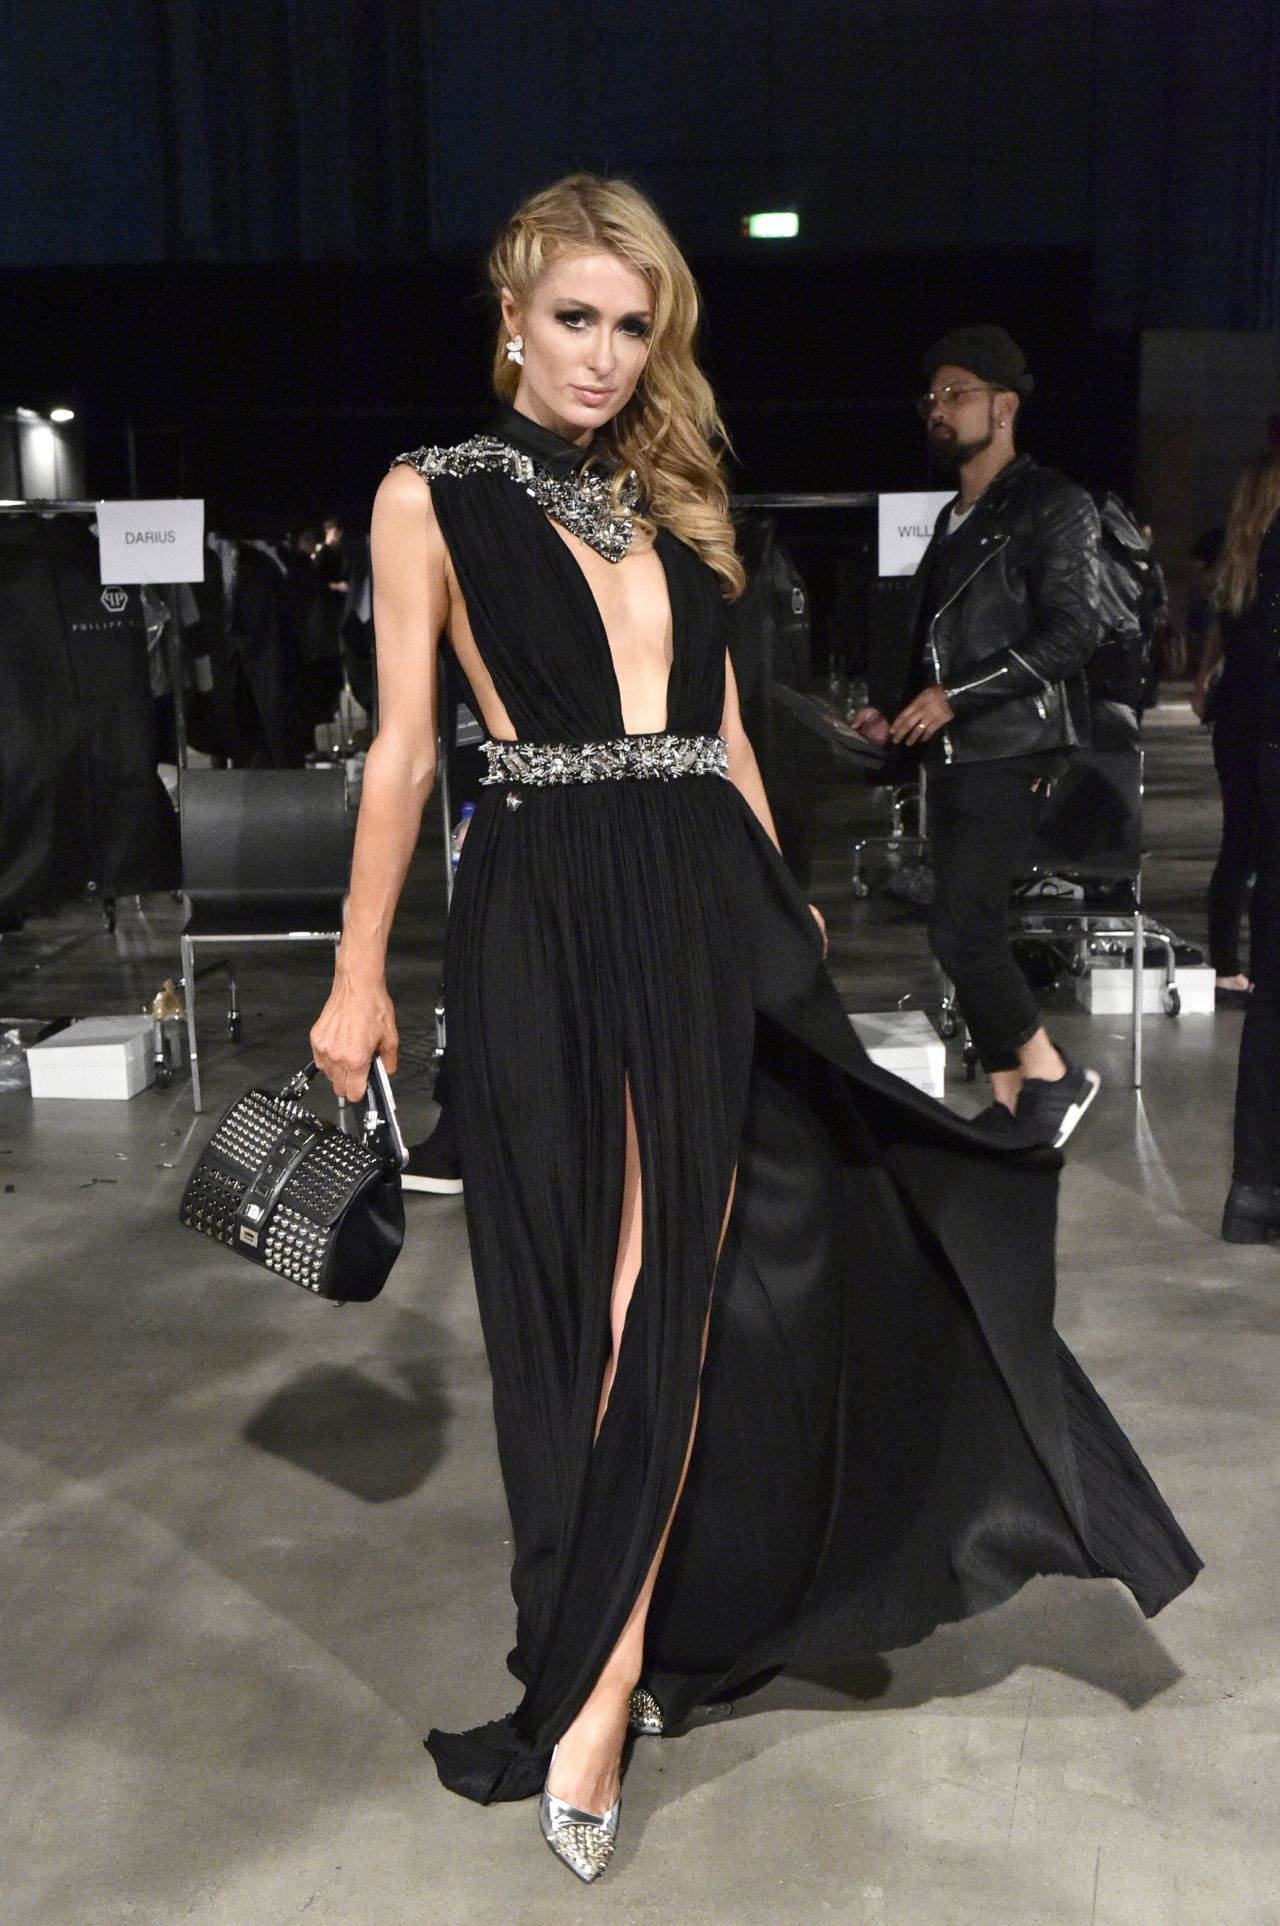 Paris Hilton | POPSUGAR Celebrity